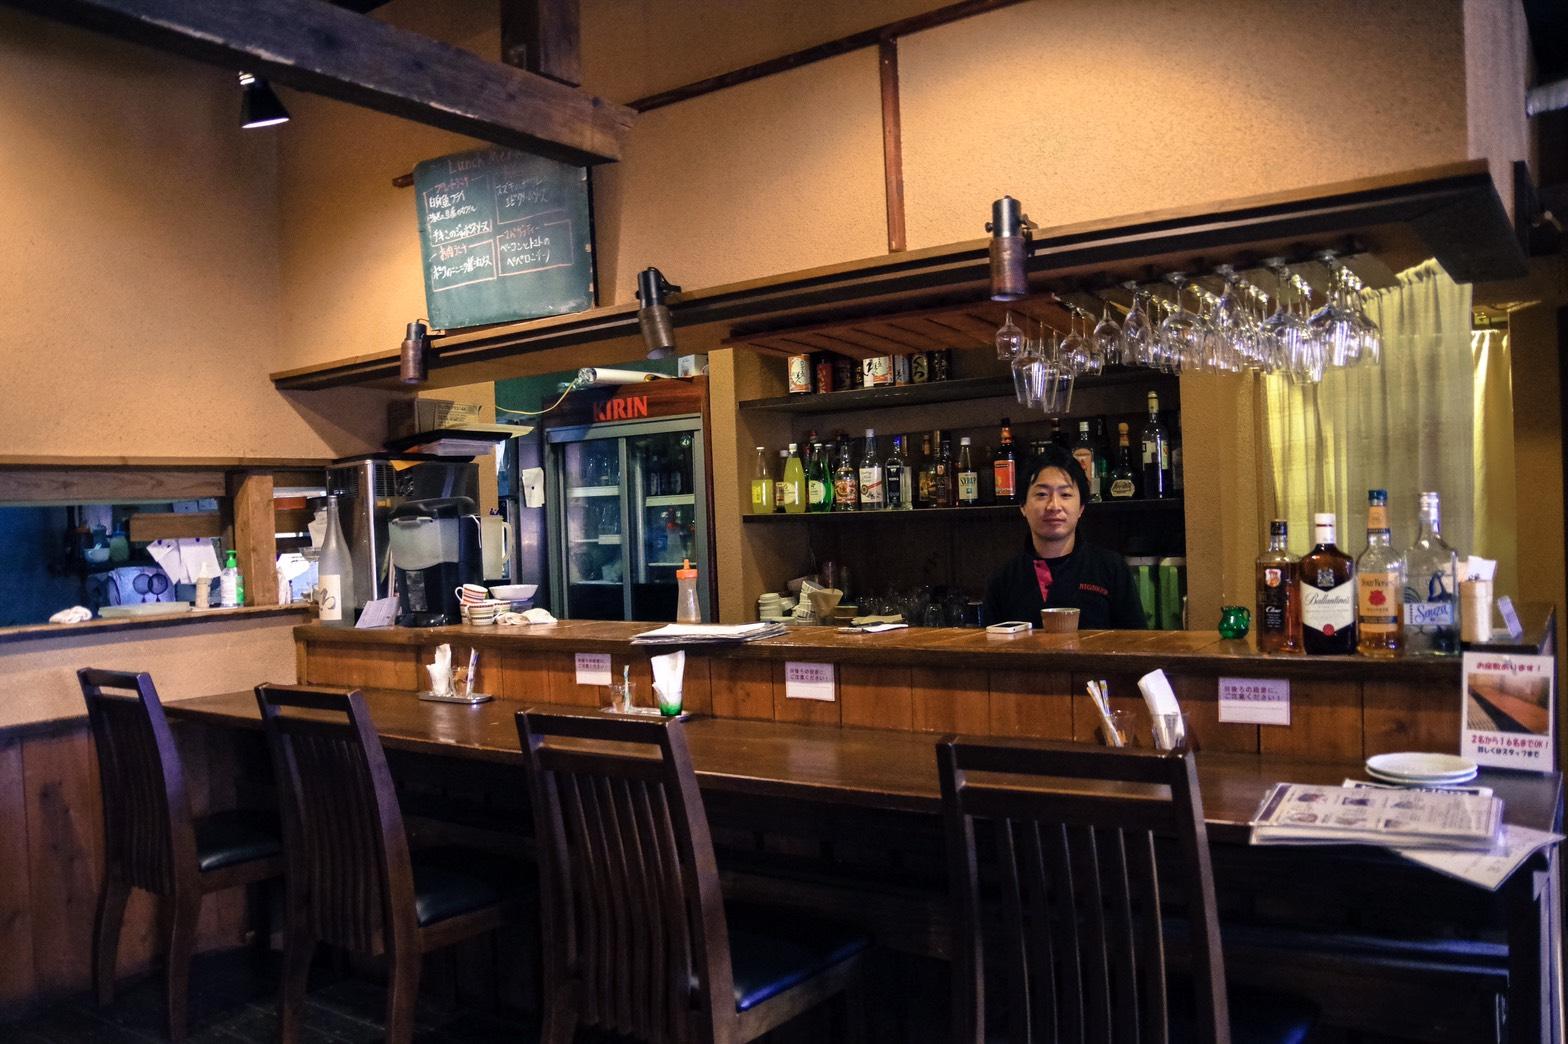 [Dining Bar BIG BEEF]お手製ハンバーグが美味しい洋食屋さん★